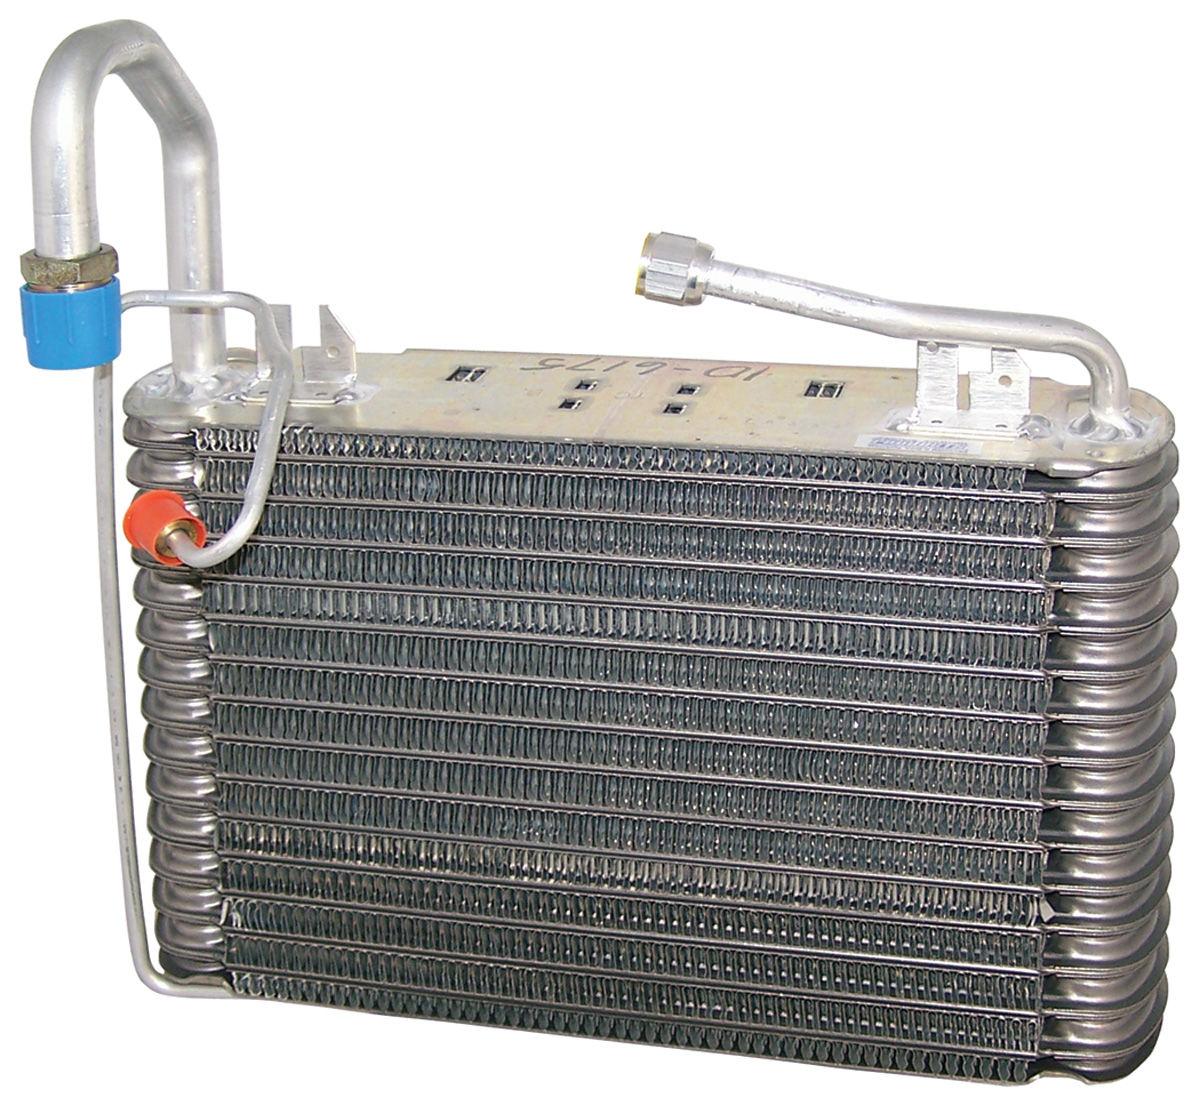 AC Evaporator, 1964 Bonneville/Catalina